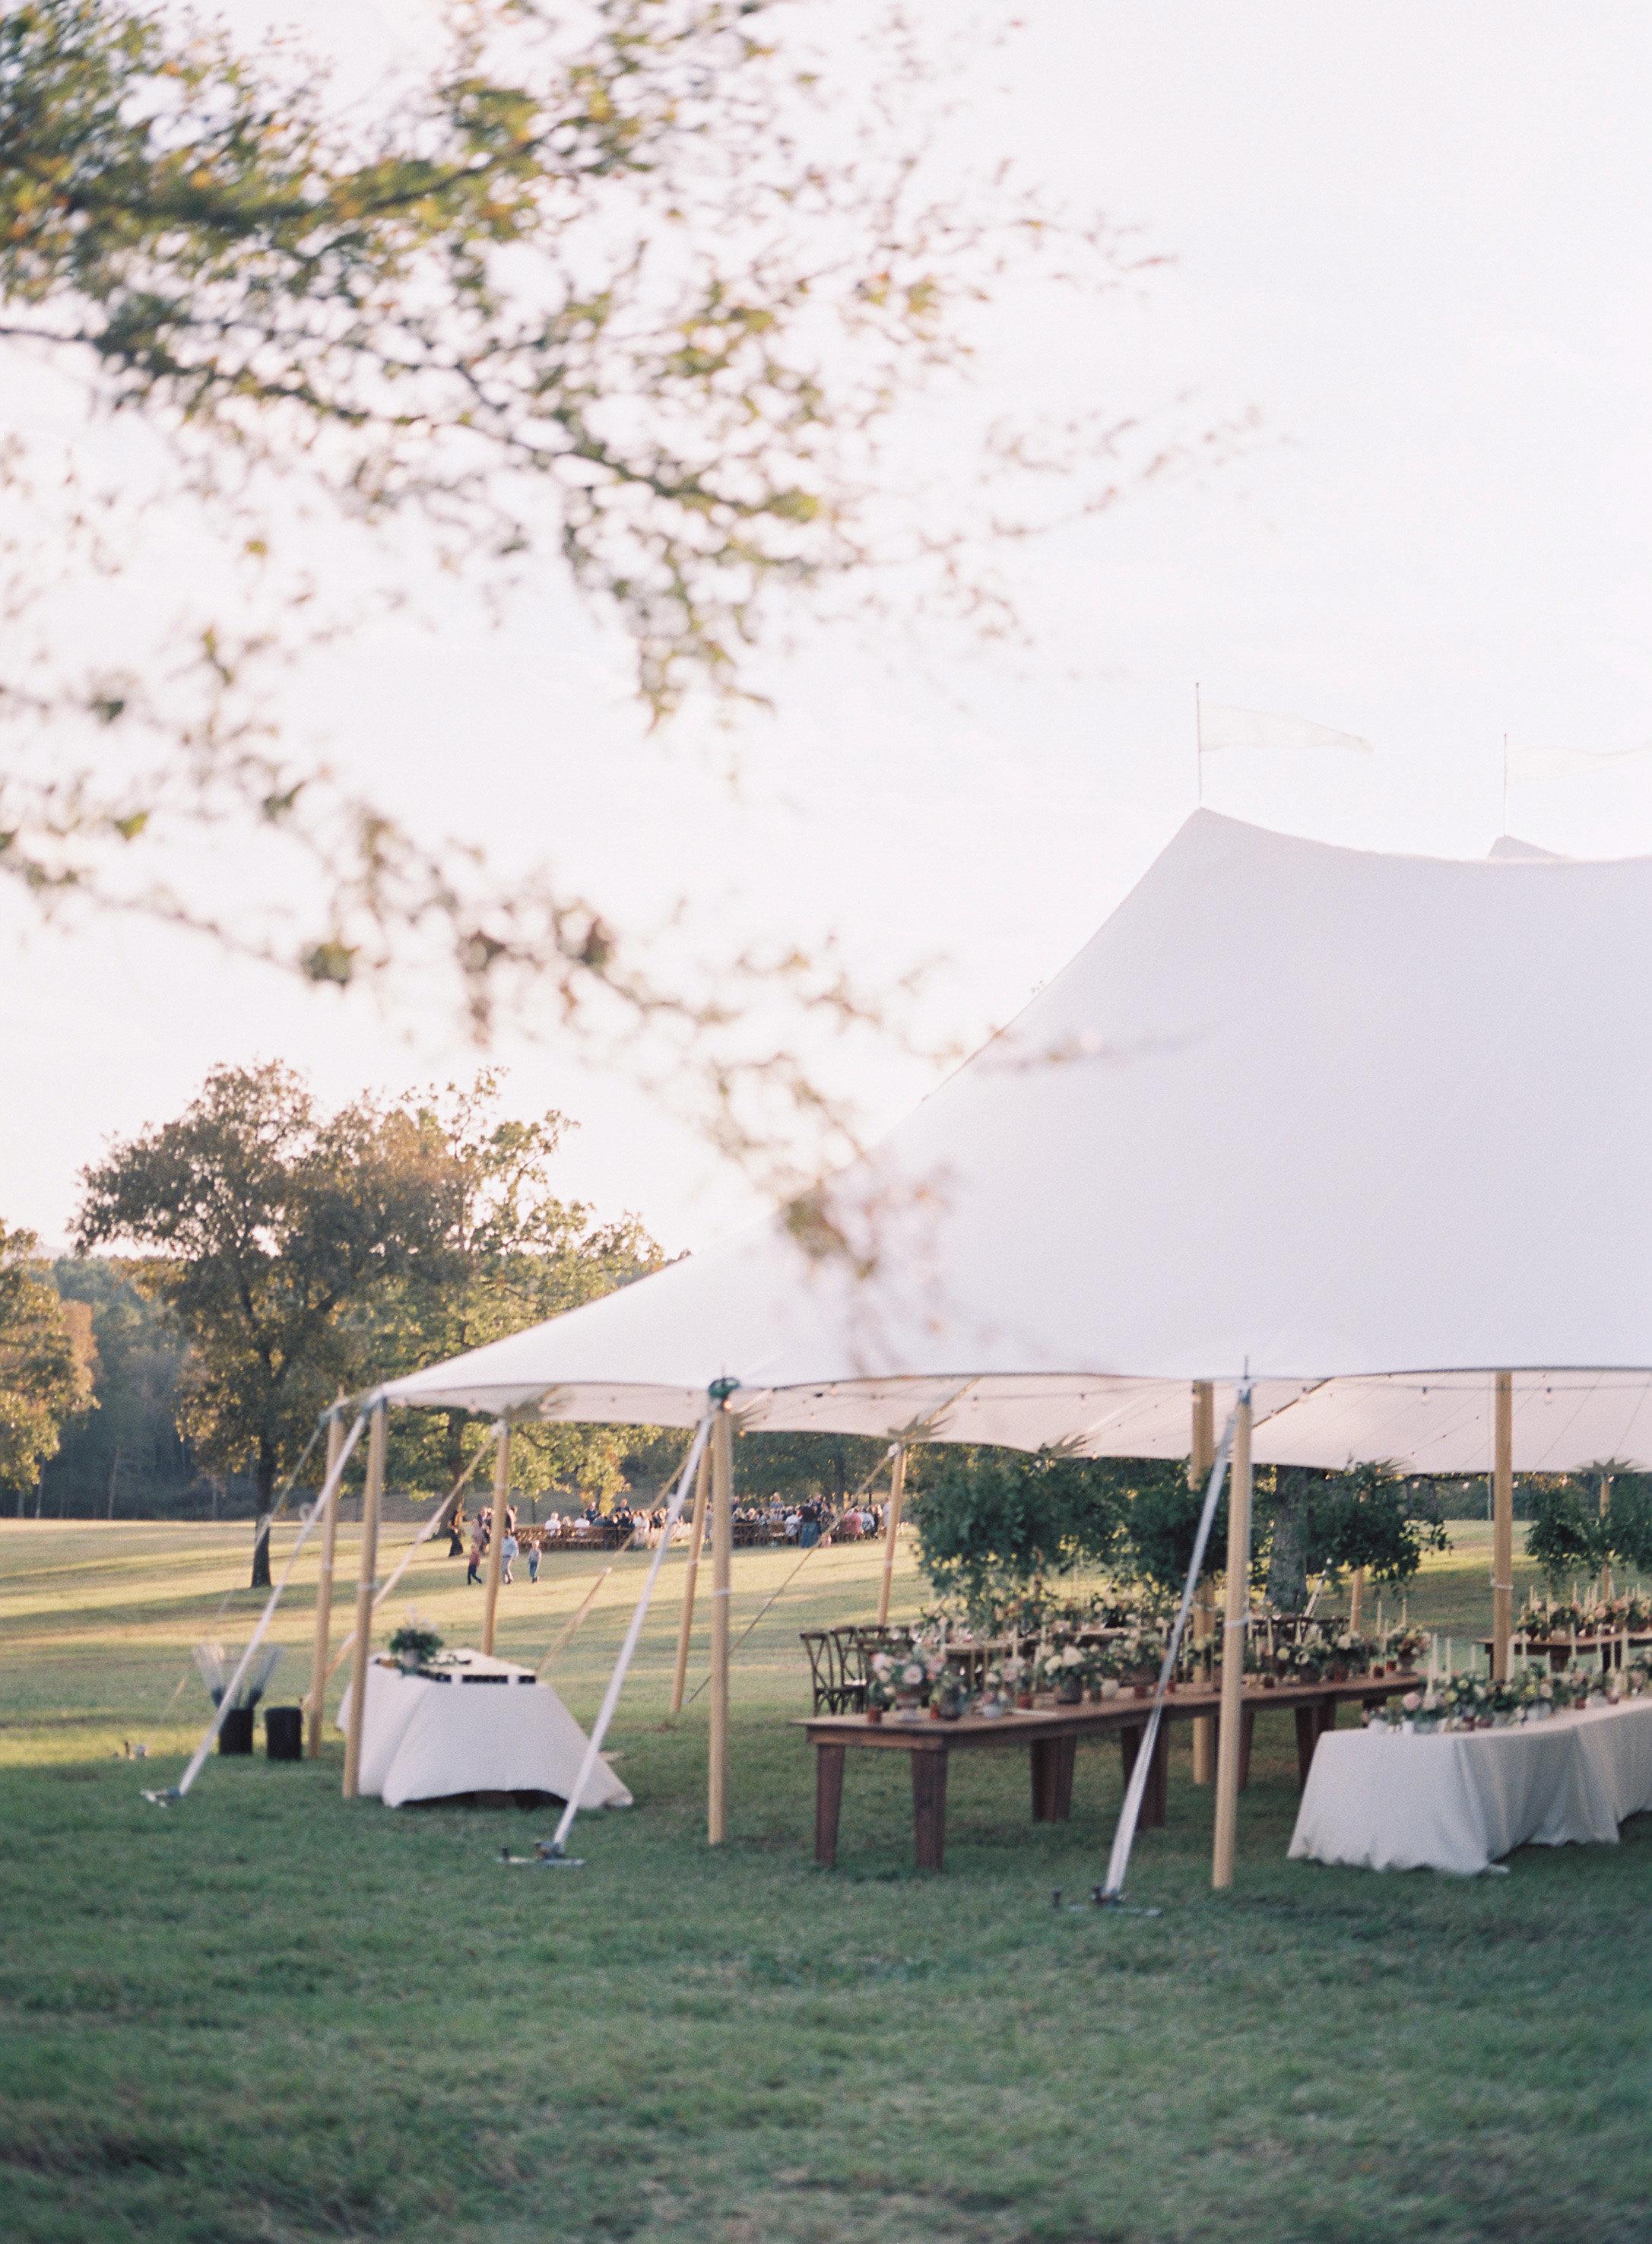 jessica-zimmerman-events-heather-payne-dan-and-shay-arkansas-wedding-reception.jpg